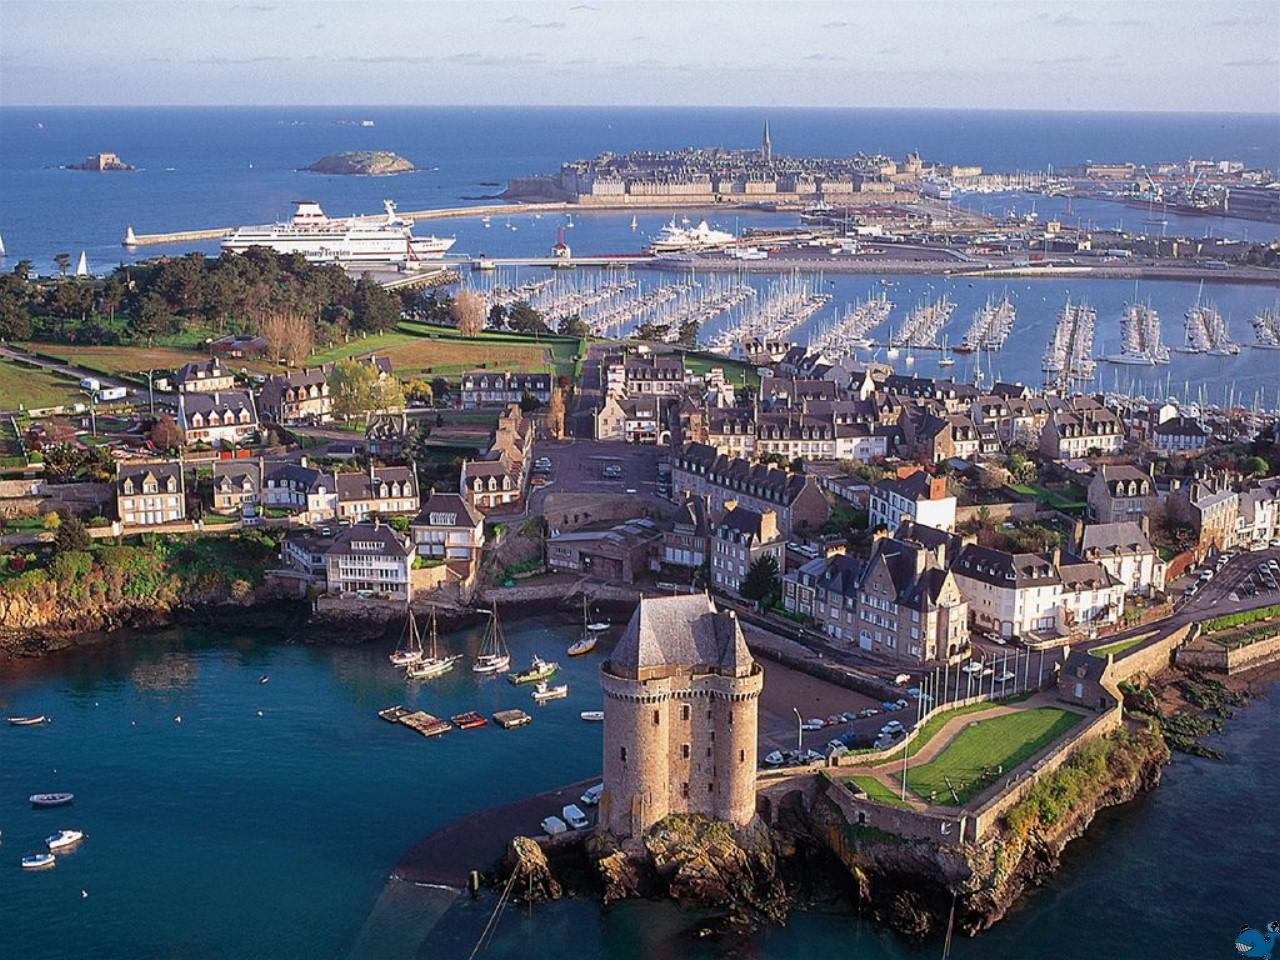 Франция: Бретань, Нормандия, Пикардия, Эндр, Руан, Луара